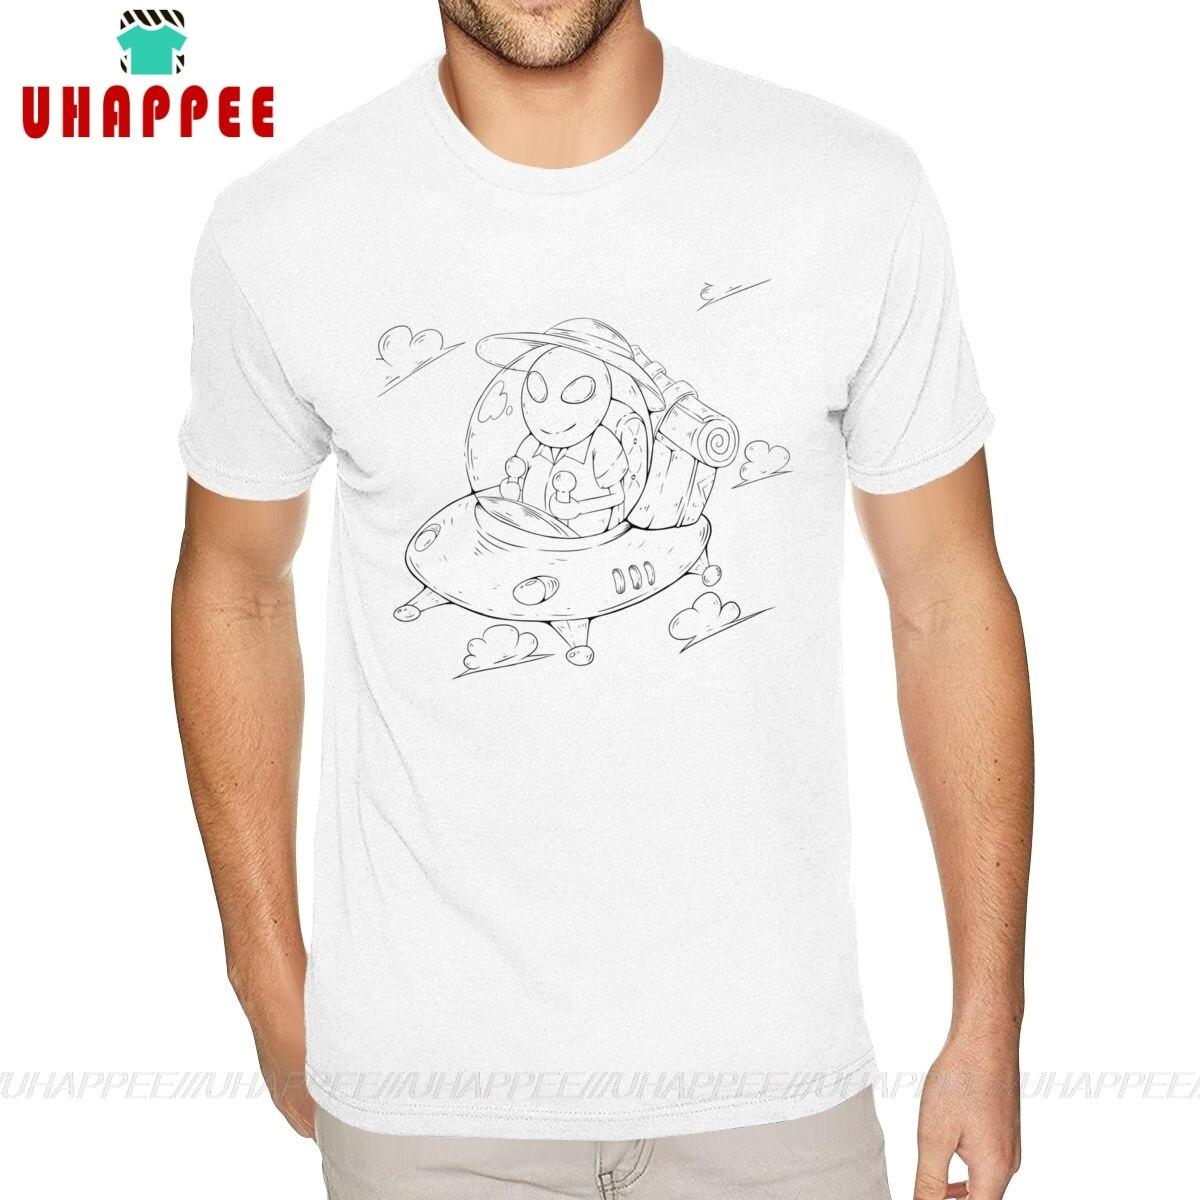 Verano Alien vacaciones Fly Travel camiseta libertad manga corta Hombre chico 5XL camiseta blanca